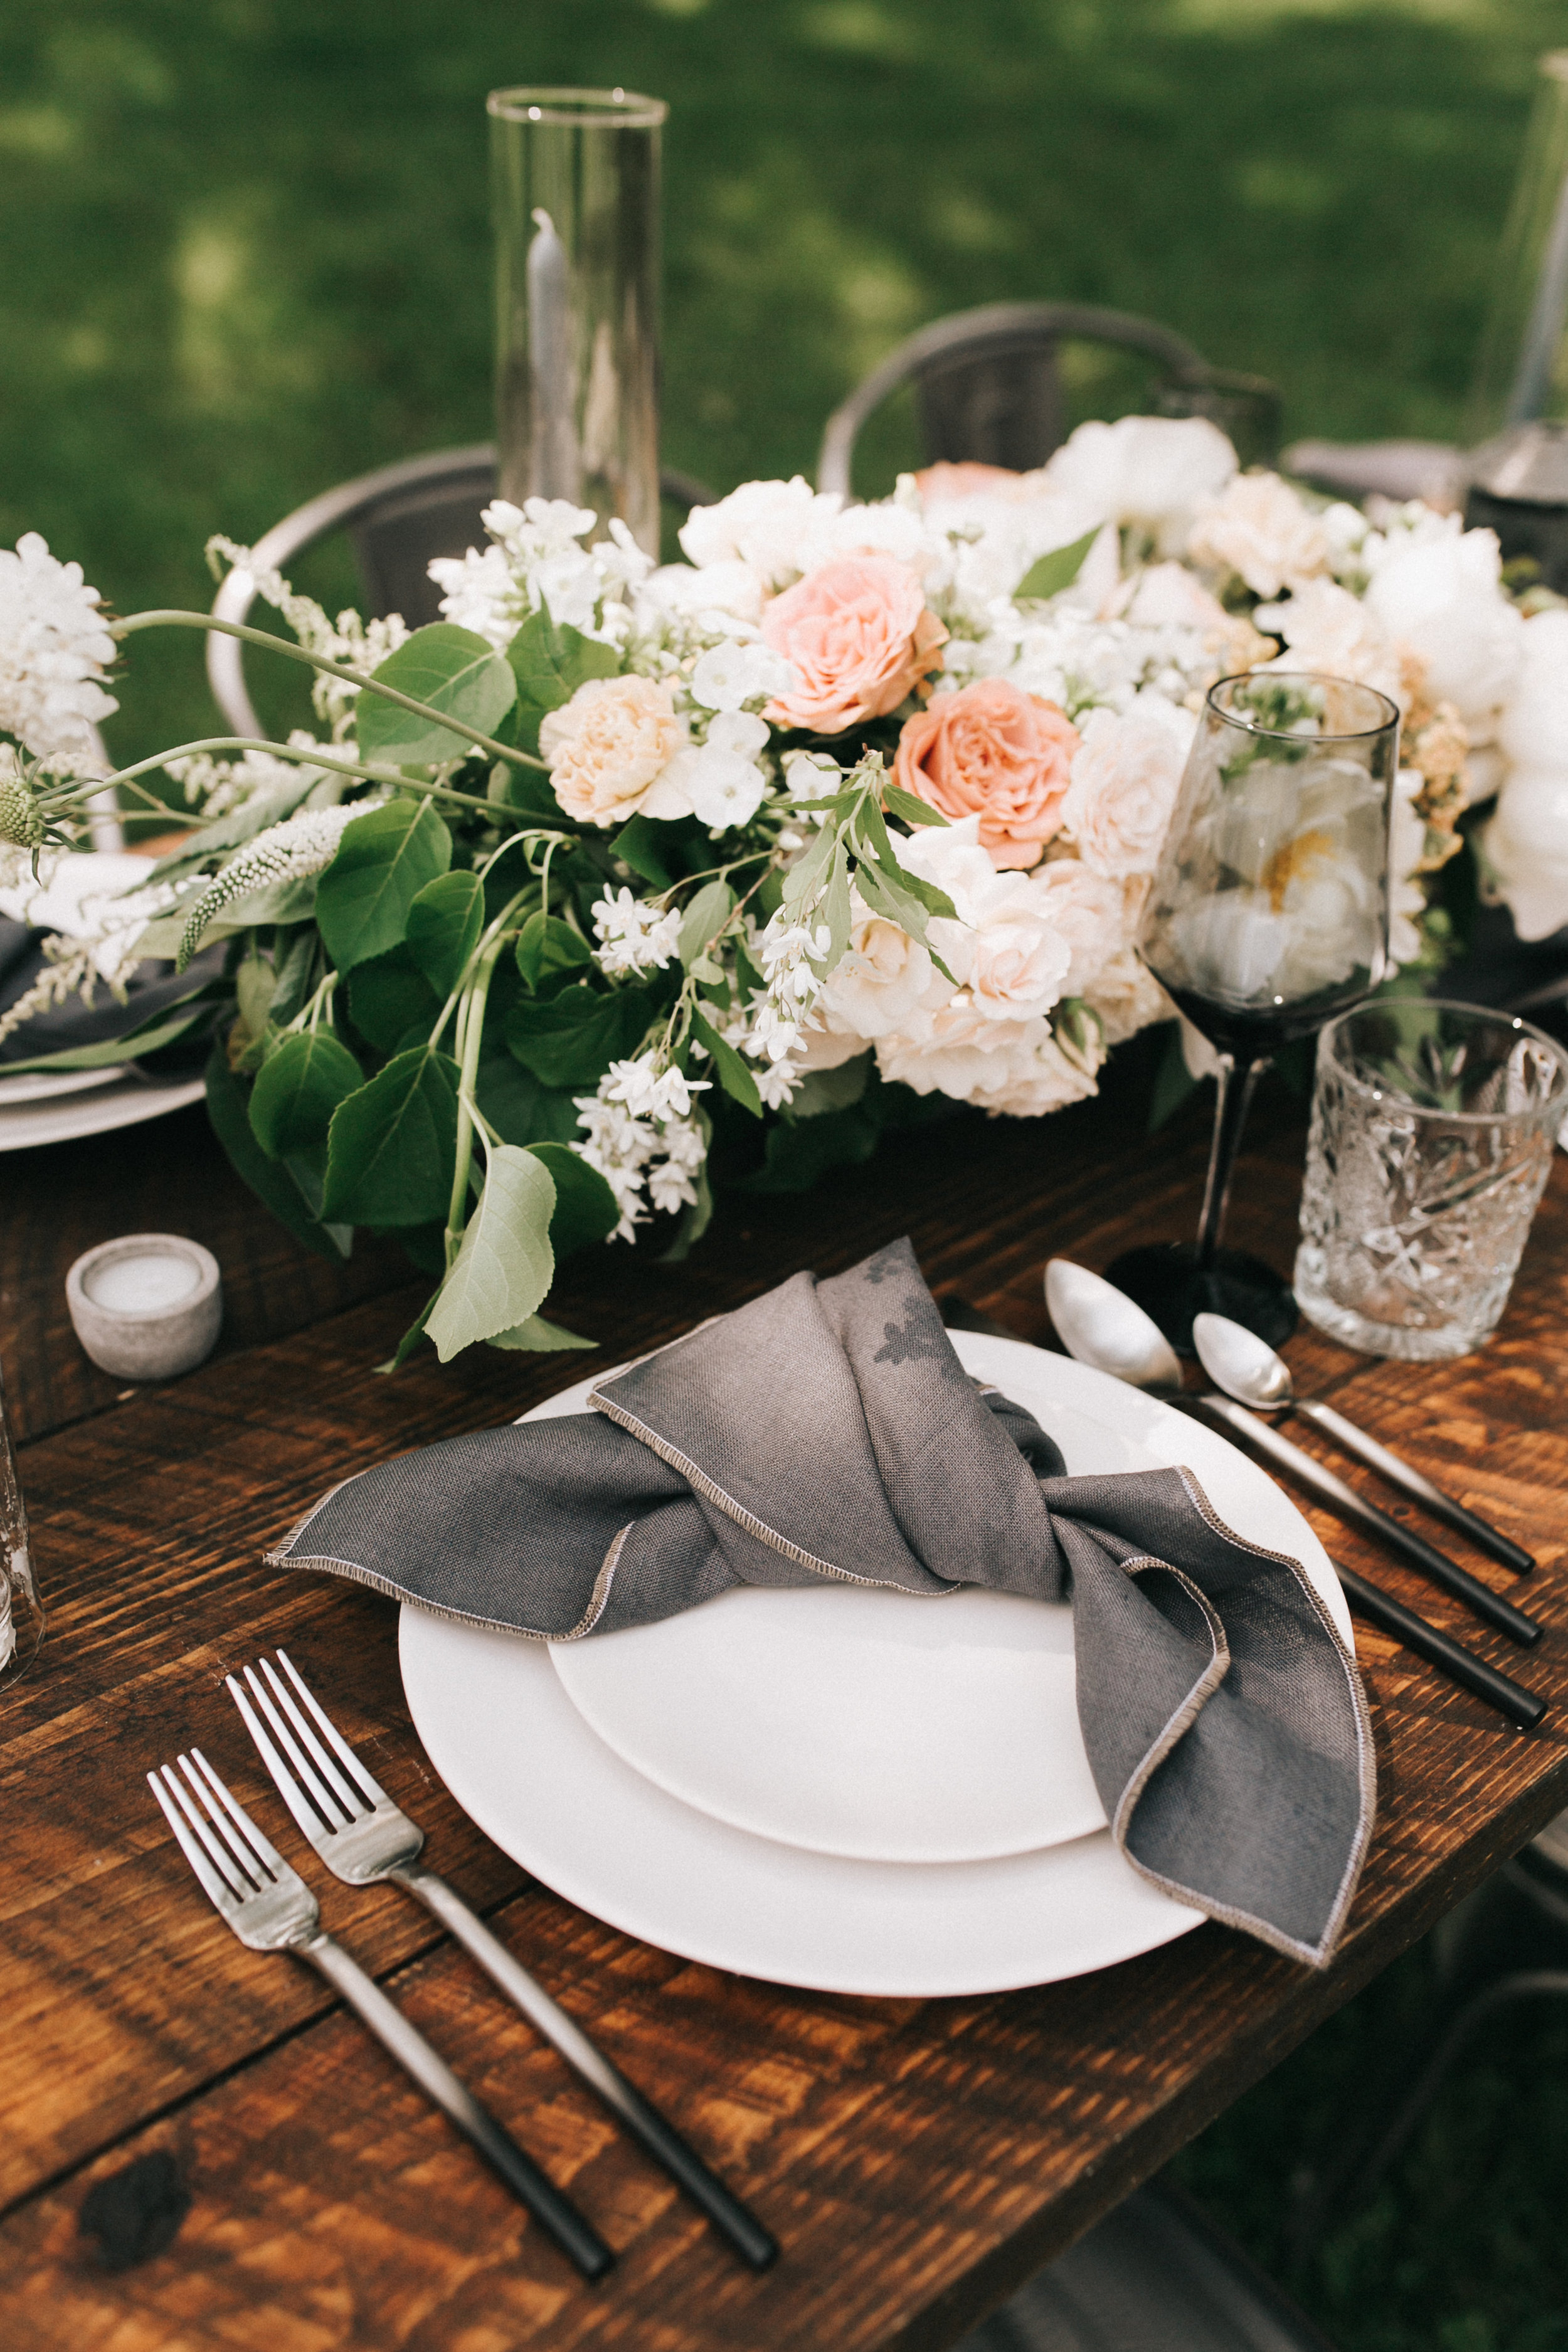 Watershed-Floral-Maine-Maritime-Wedding-Bridal-Bouquet-Centerpieces-0003.jpg